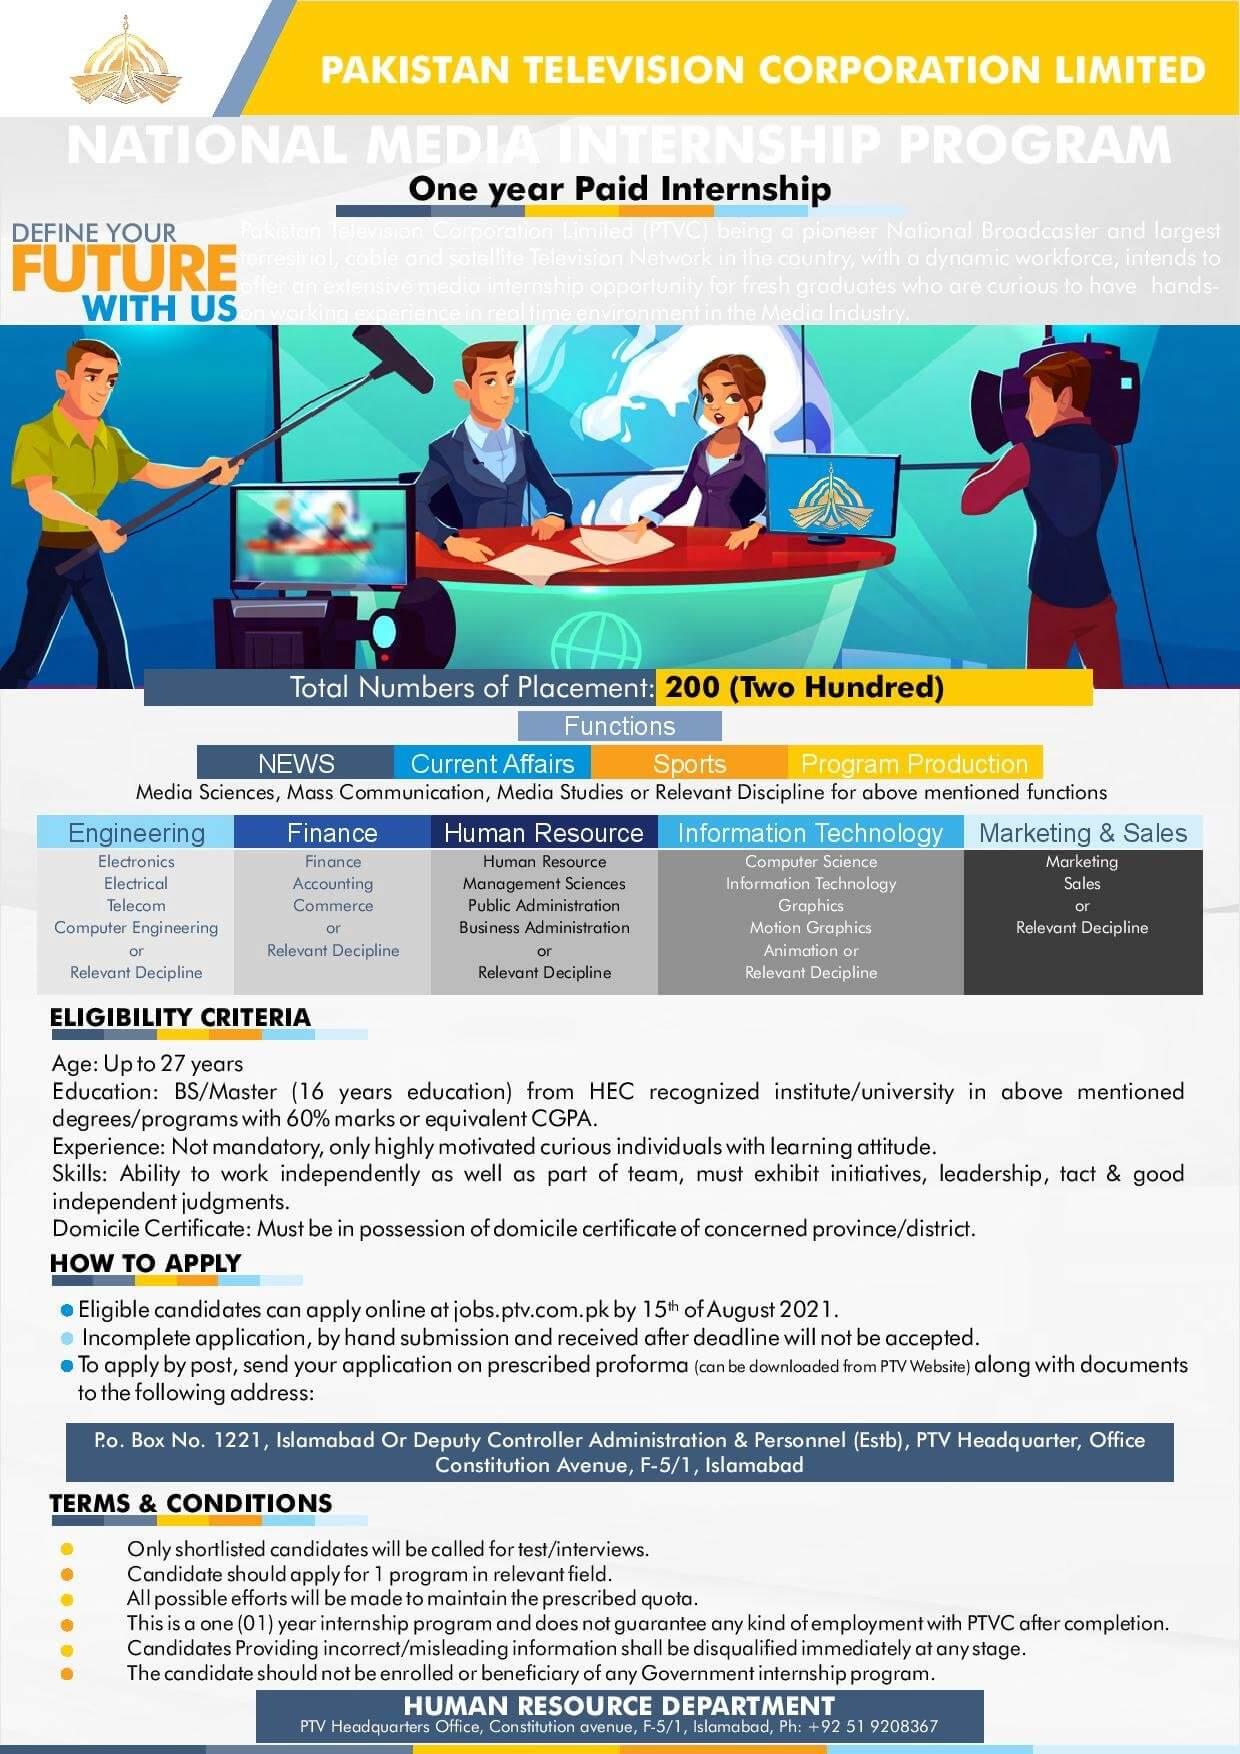 Pakistan Television Corporation Limited (PTV) Multan internship 2021 - PTV Internship 2021 - PTV Multan Jobs 2021 - PTV Jobs 2021 - PTV Online Jobs 2021